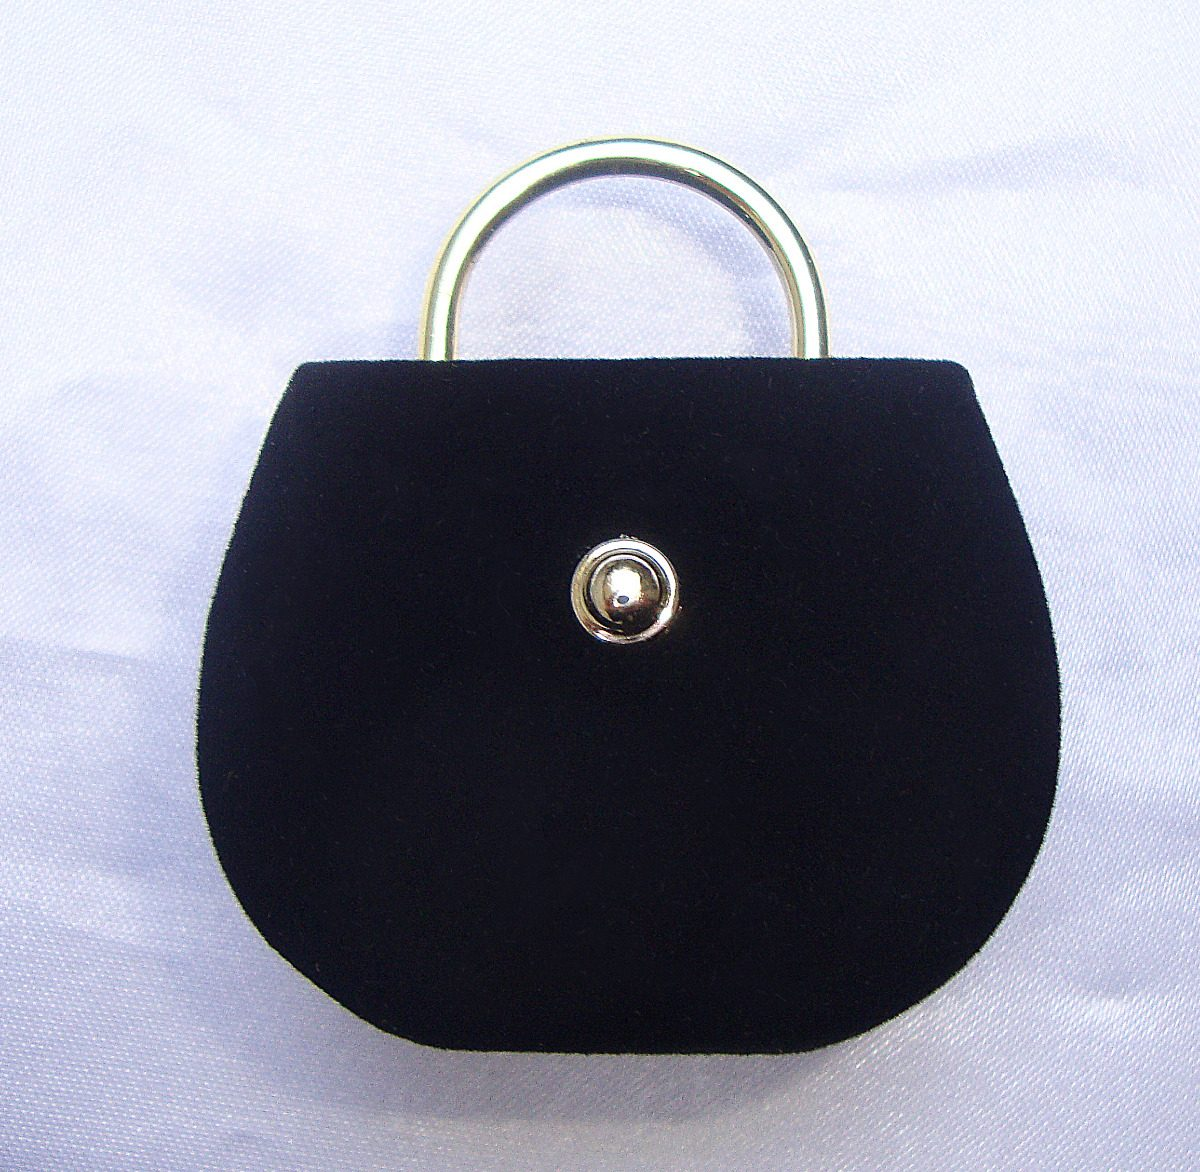 Mano 00 130 De Joyería Bolsa Aretes Regalo Negra caja Estuche q4vPnH